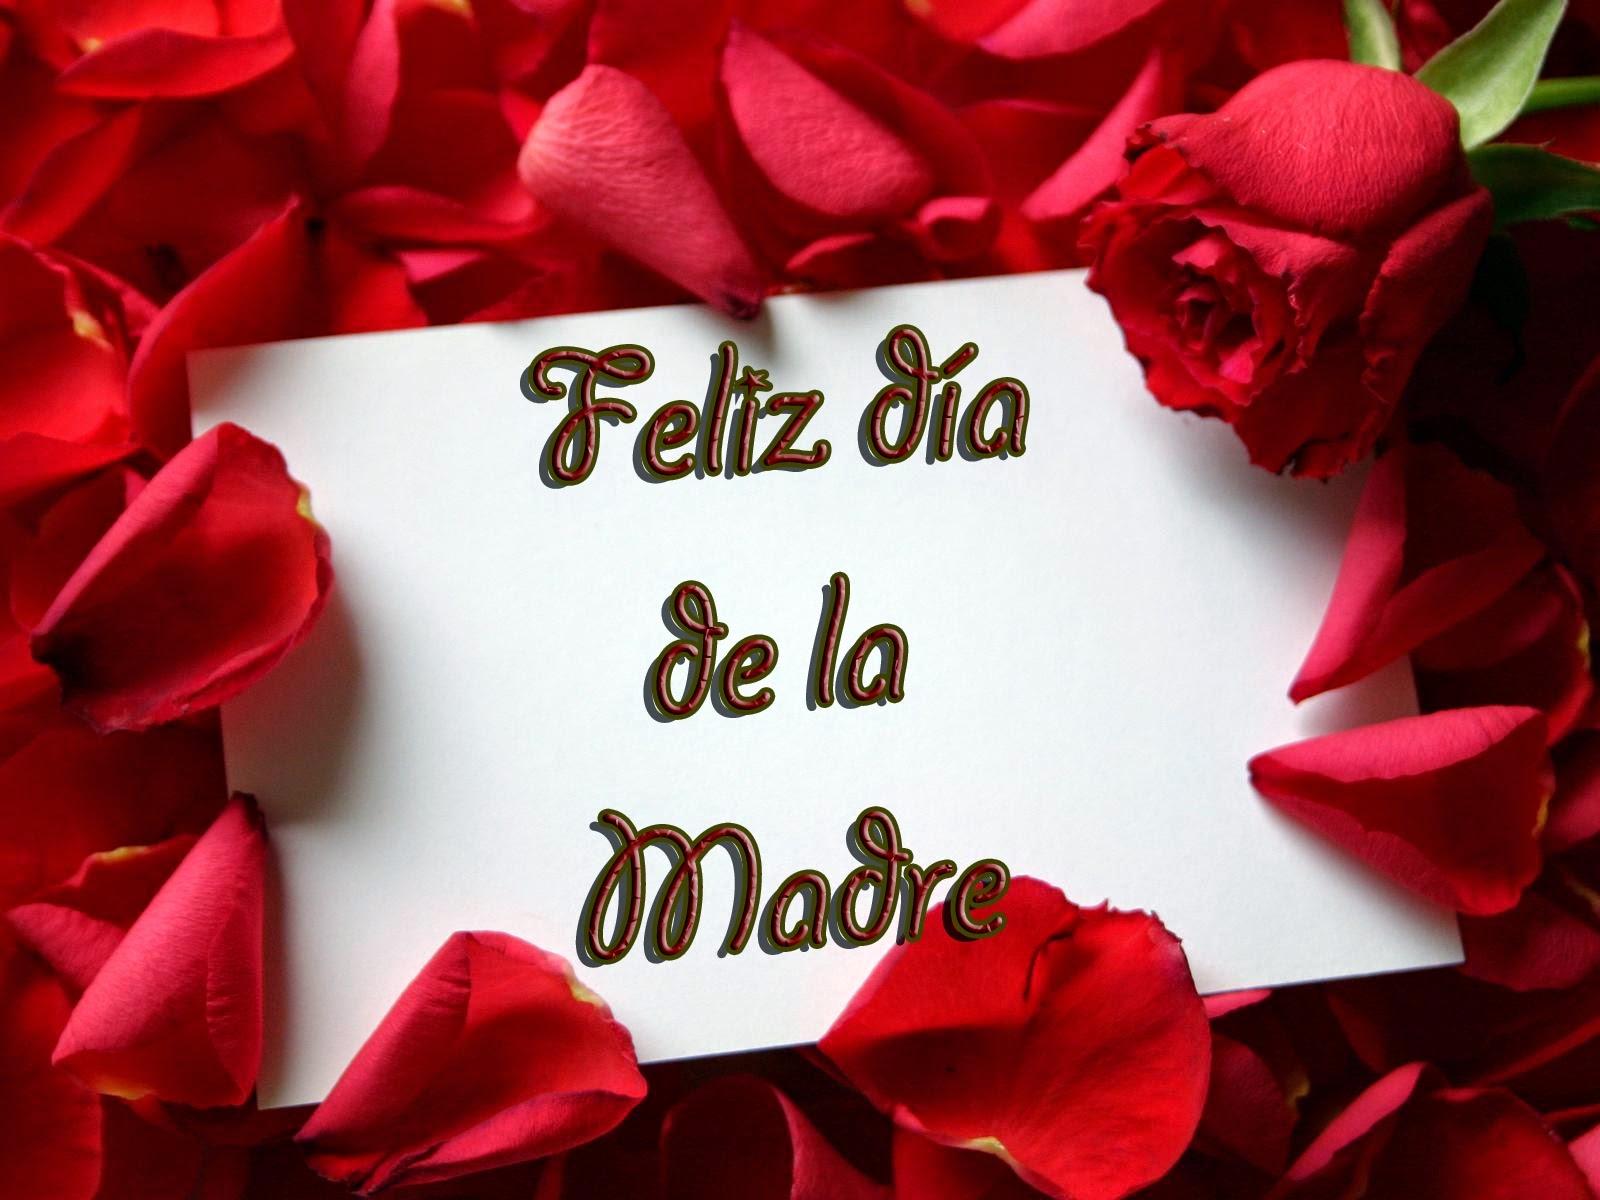 sretan rođendan na španjolskom 1600x1200 Pozadine za desktop: Čestitka Sretan majčin dan na  sretan rođendan na španjolskom